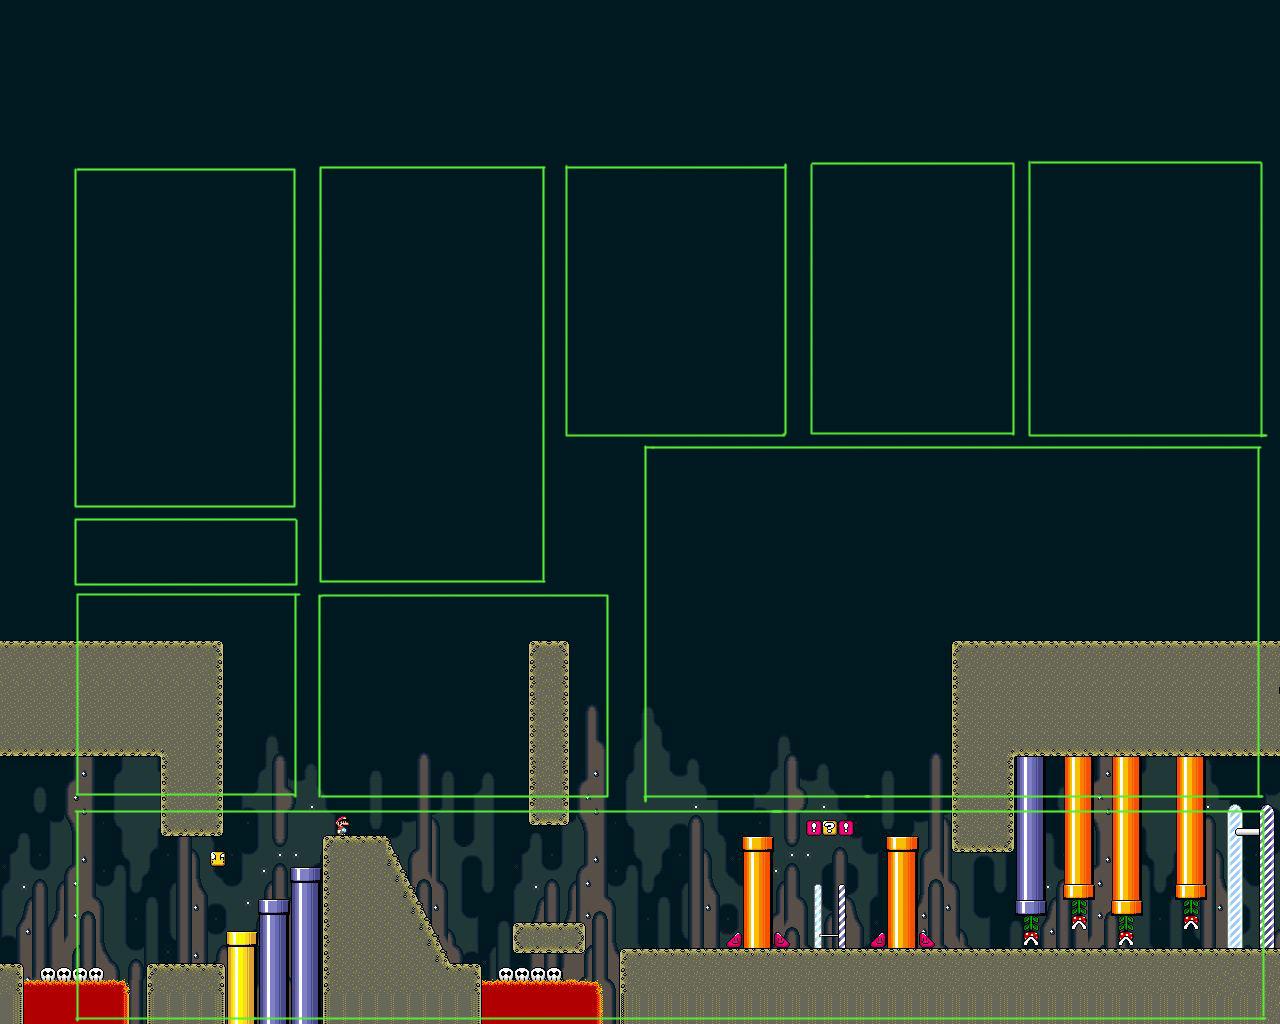 Super Mario Myspace div layout